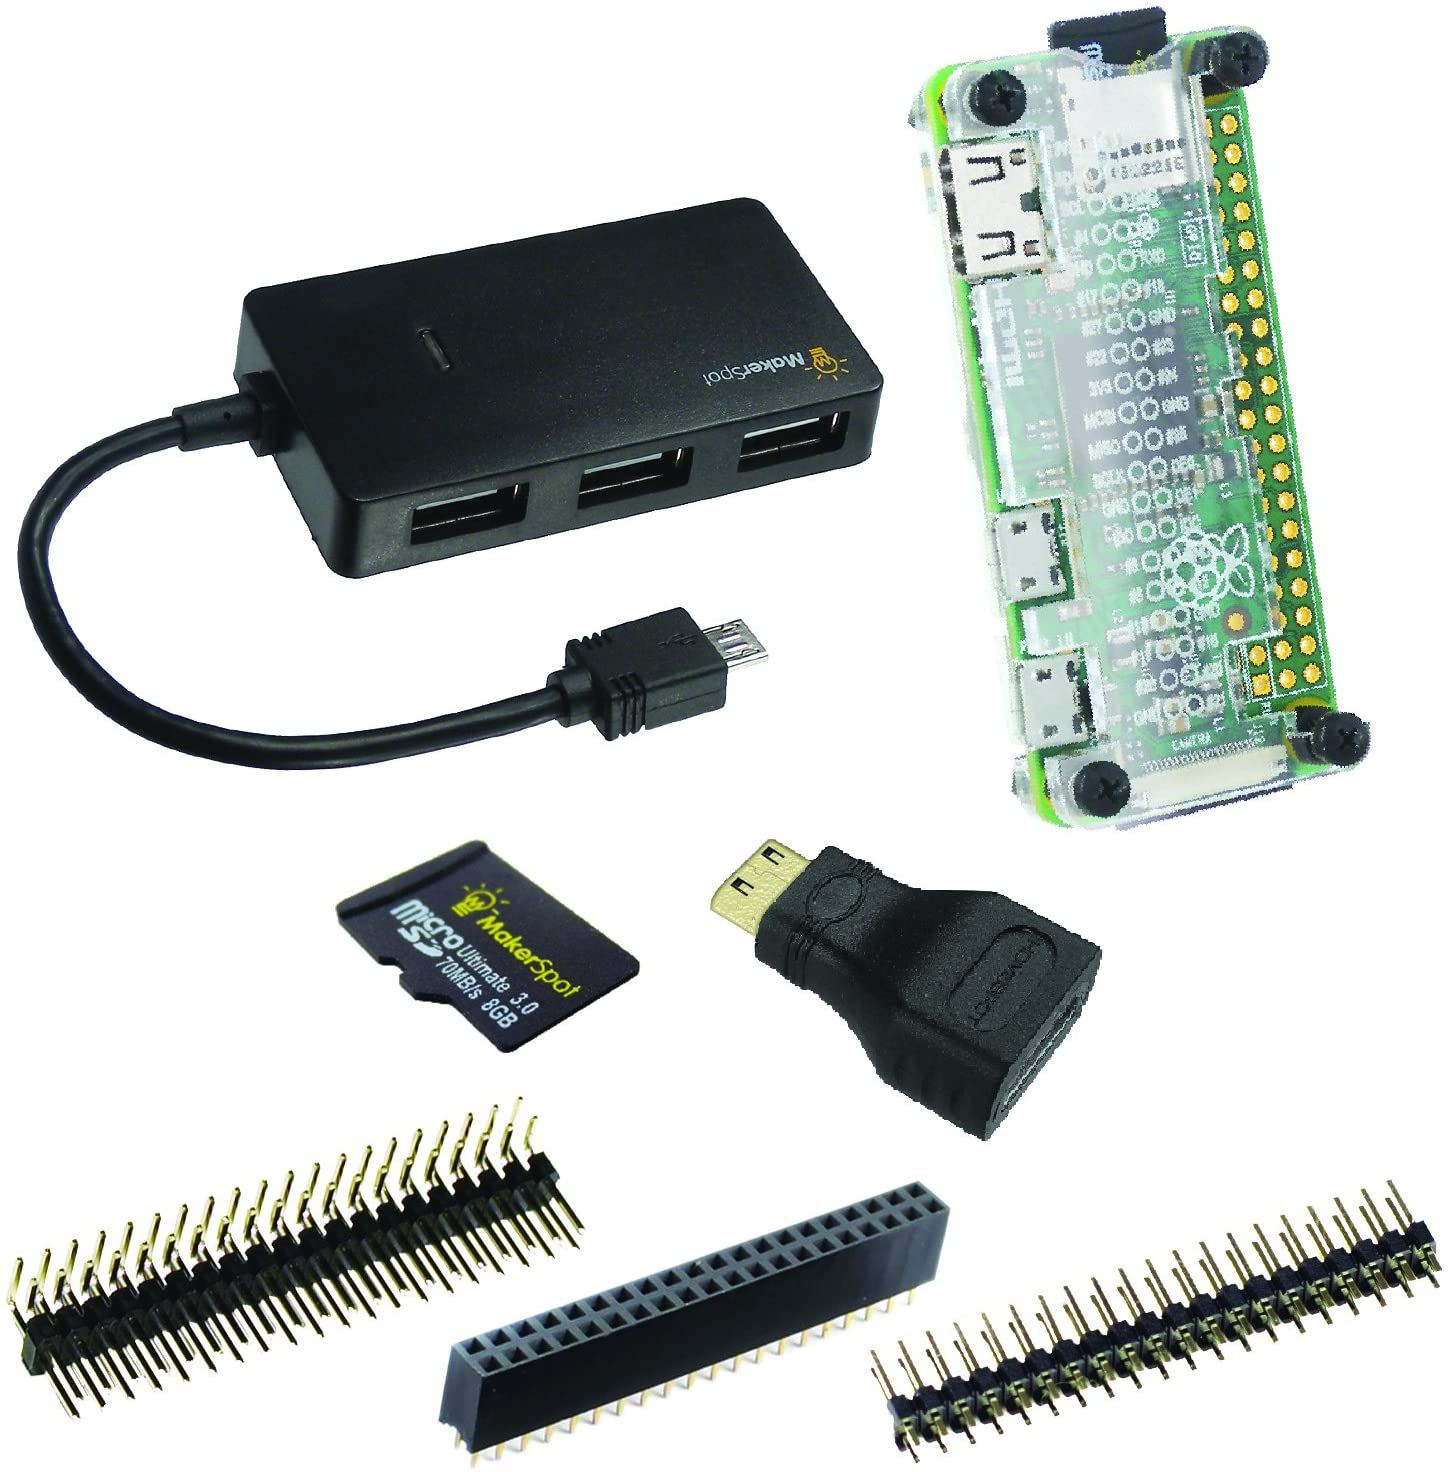 MakerSpot 7-in-1 Raspberry Pi Zero W Mega Pack  with 8GB Mic